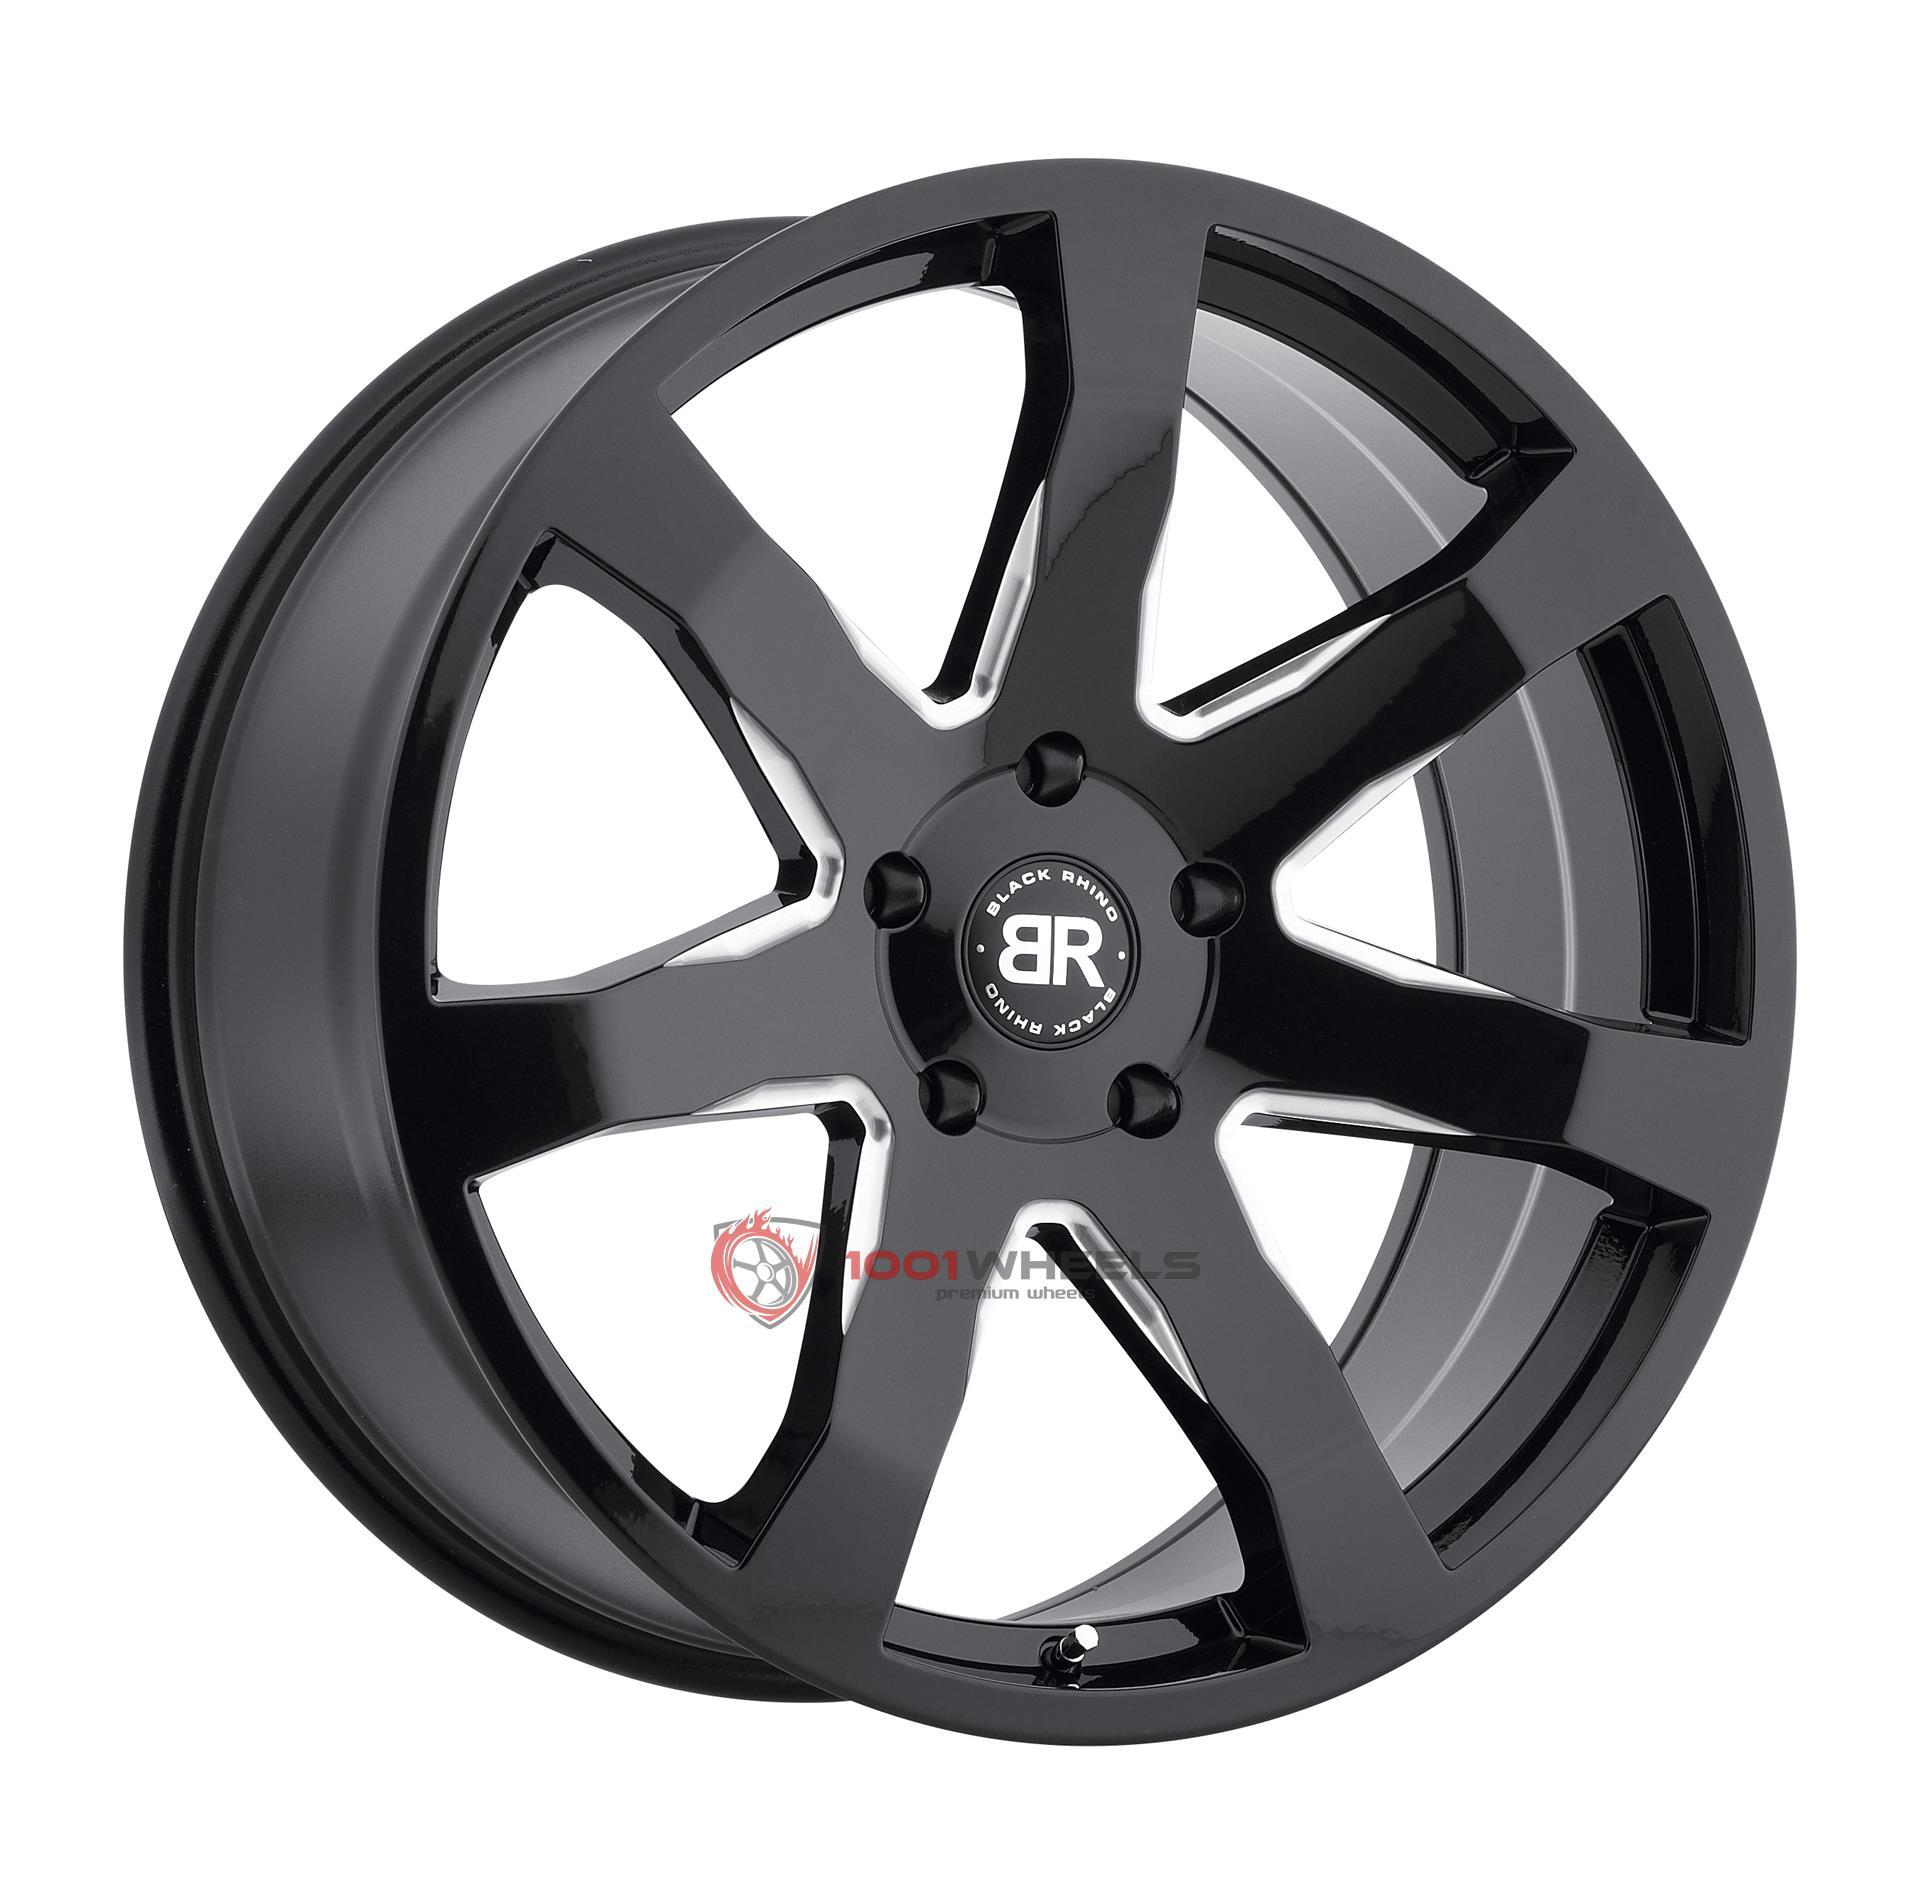 BLACK RHINO MOZAMBIQUE gloss-black-wmilled-spokes